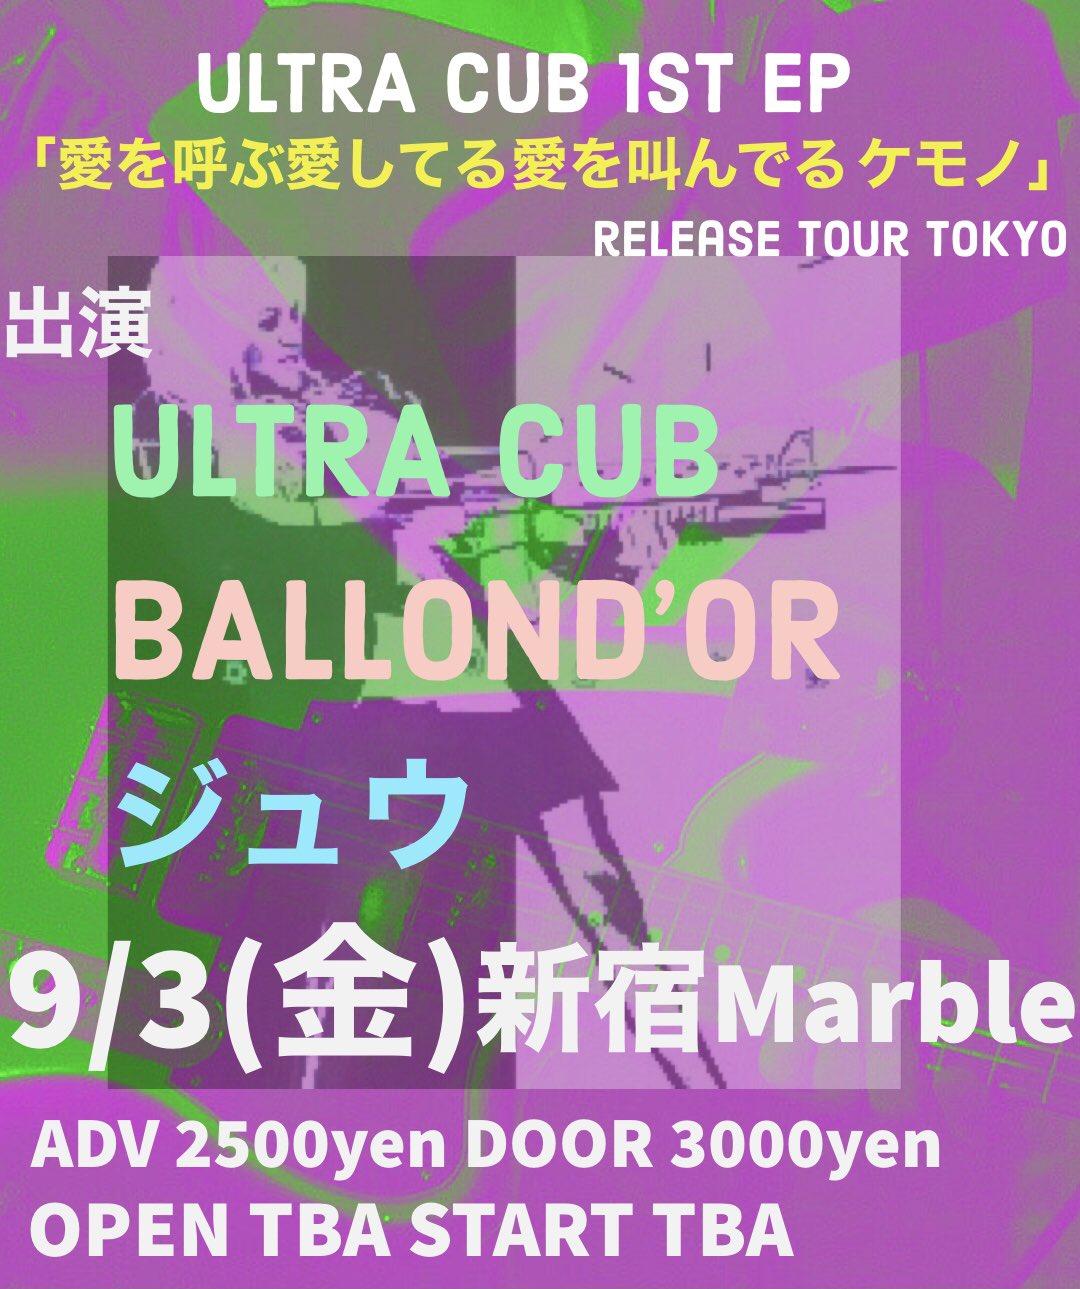 ULTRA CUB 1st EP「愛を呼ぶ愛してる愛を叫んでるケモノ」Release tour東京編